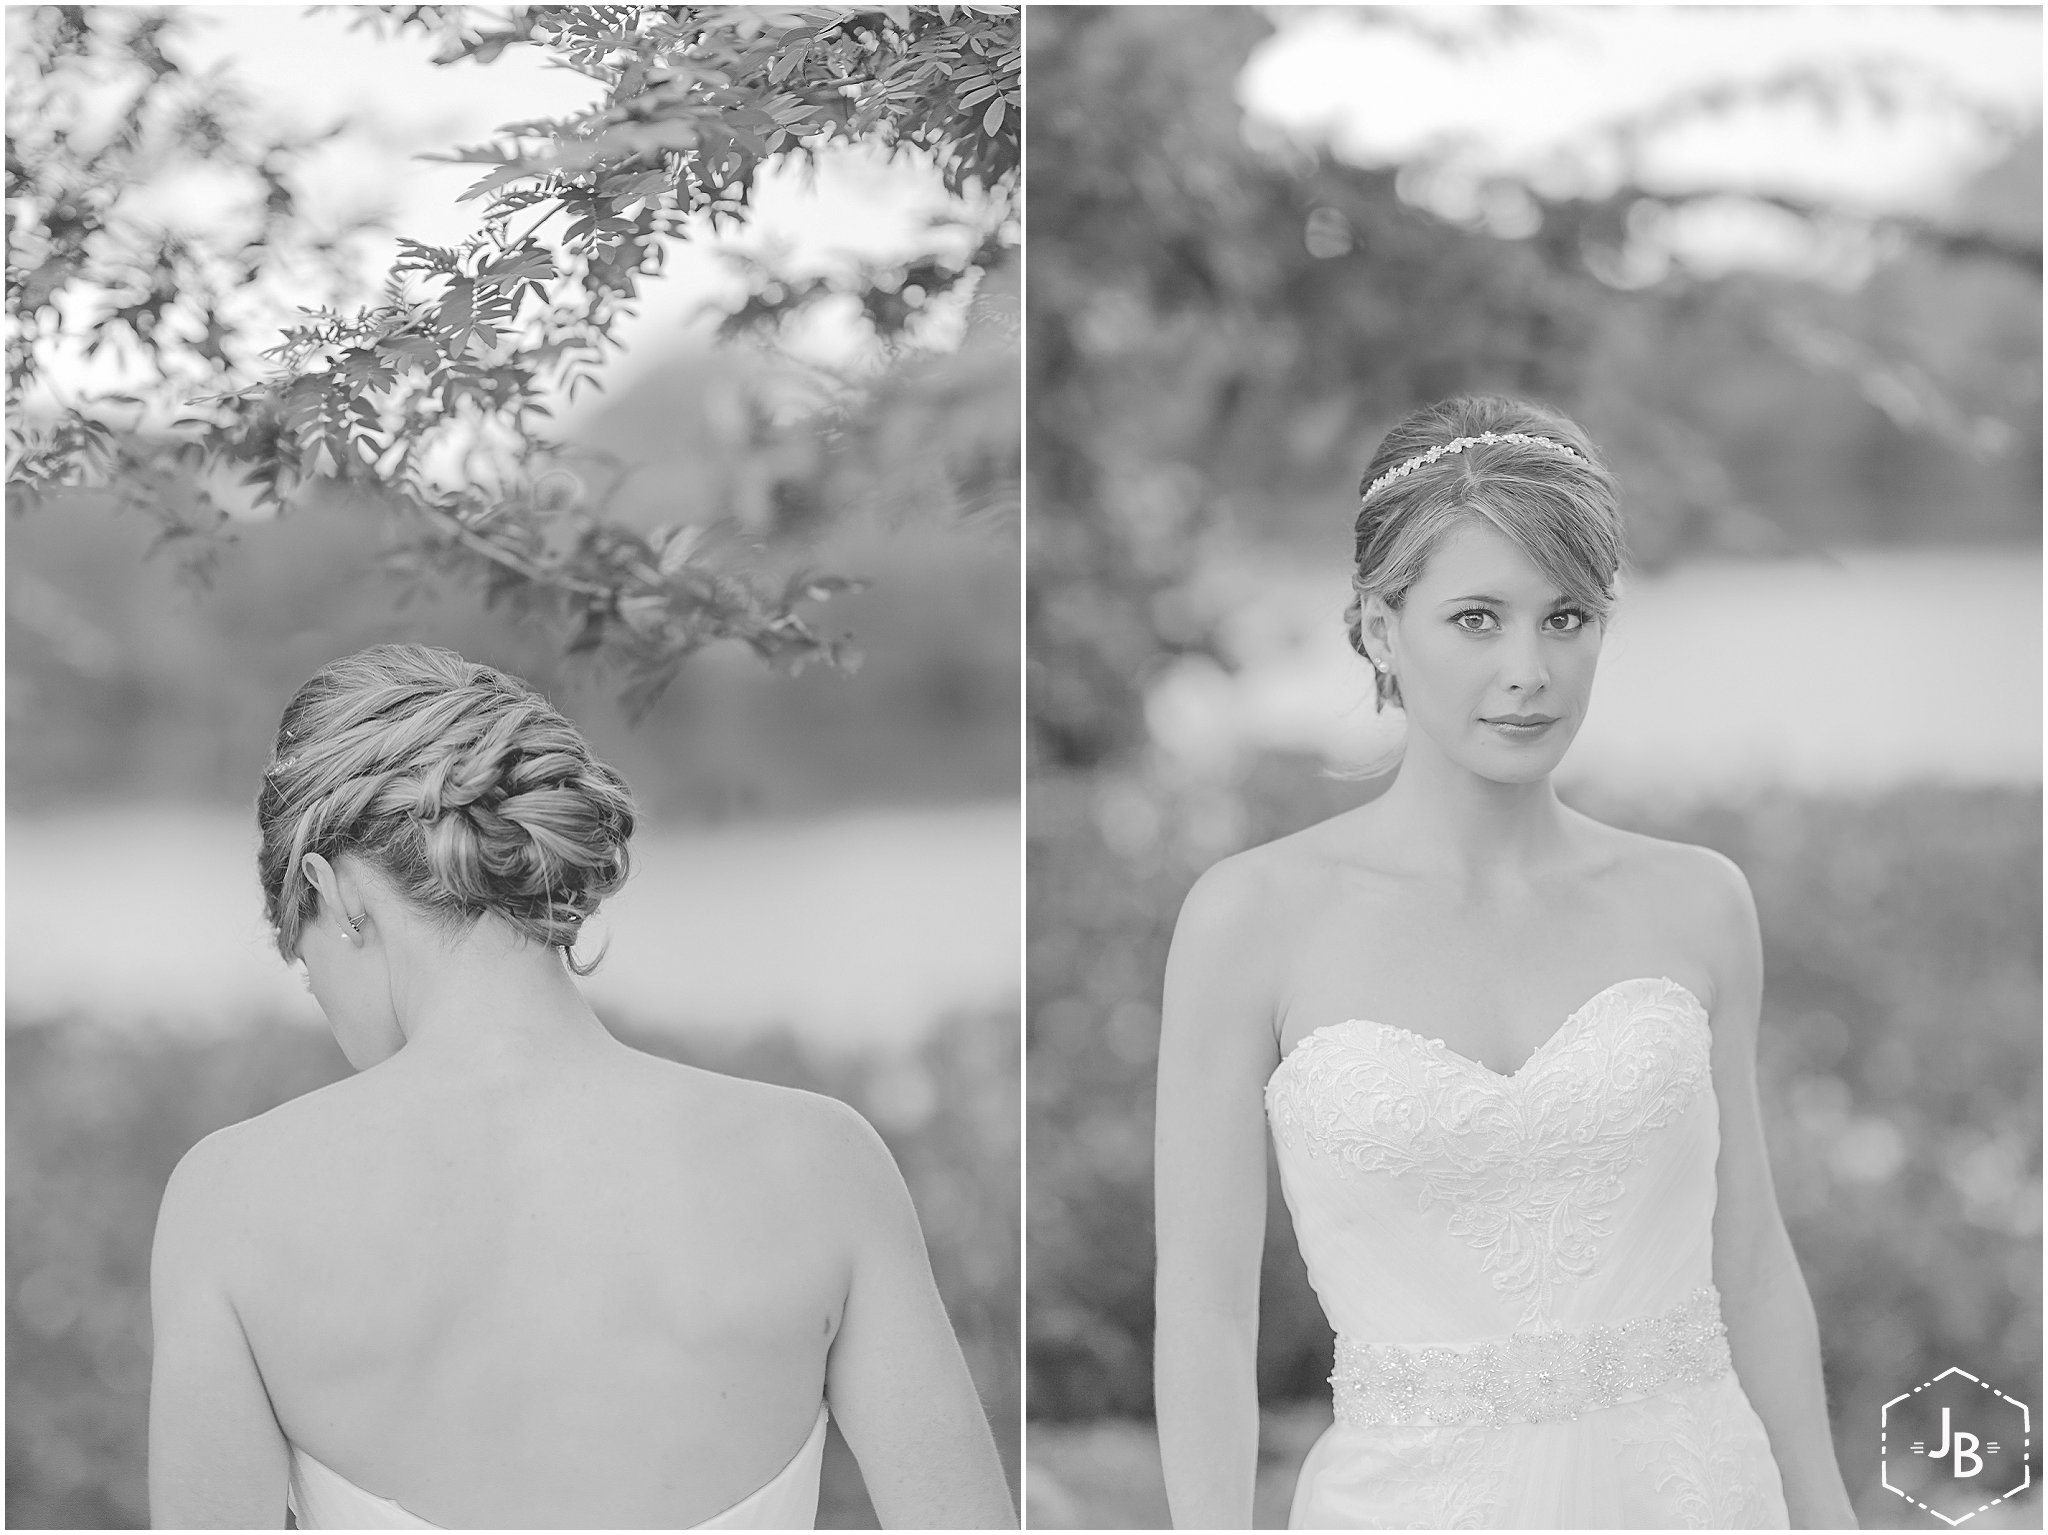 WeddingandEngagementFloridaPhotographer_0342.jpg